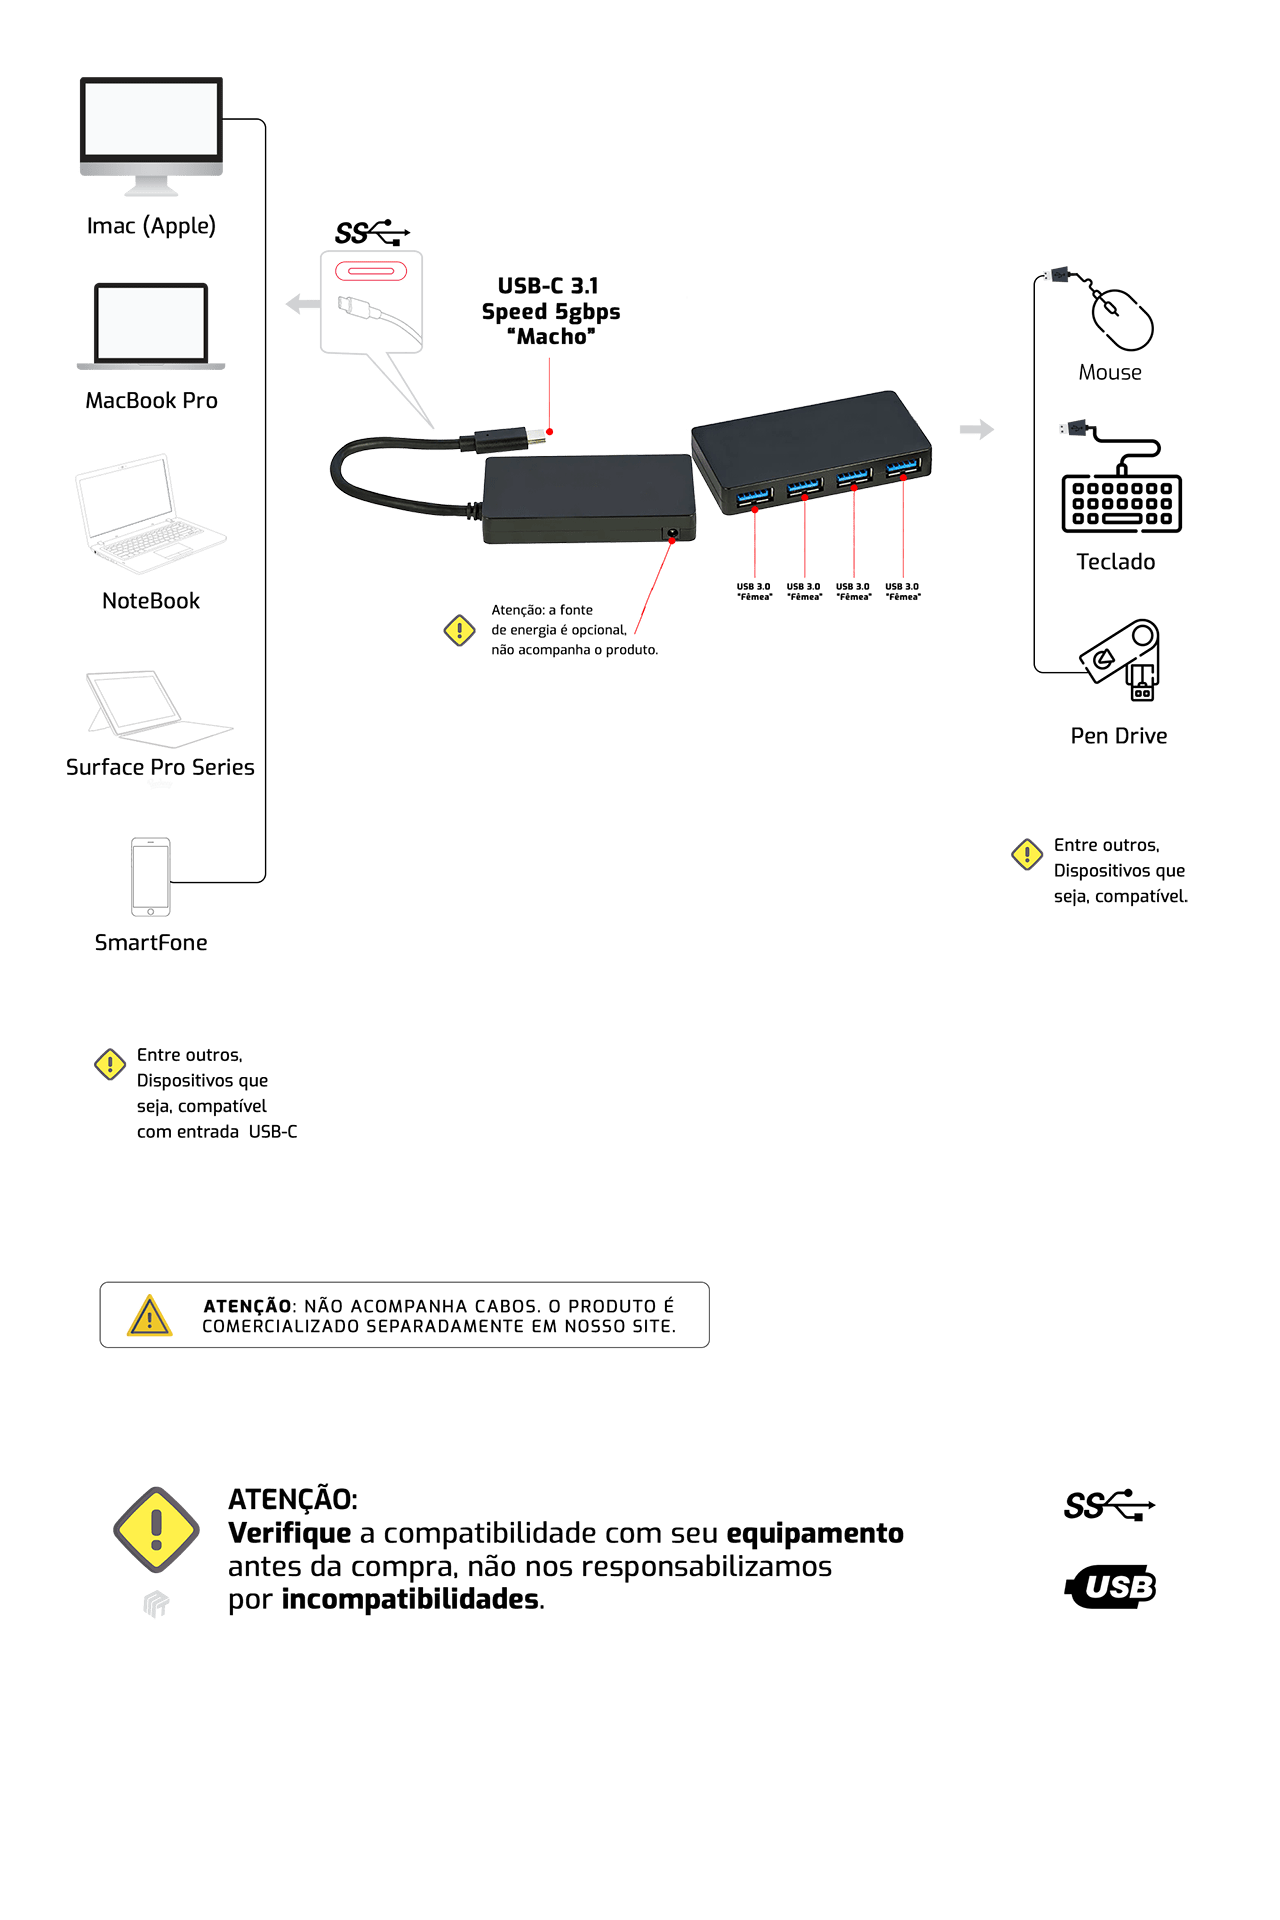 HUB Adaptador USB Tipo C 4 Portas USB 3.0 - Speed 5 Gbps